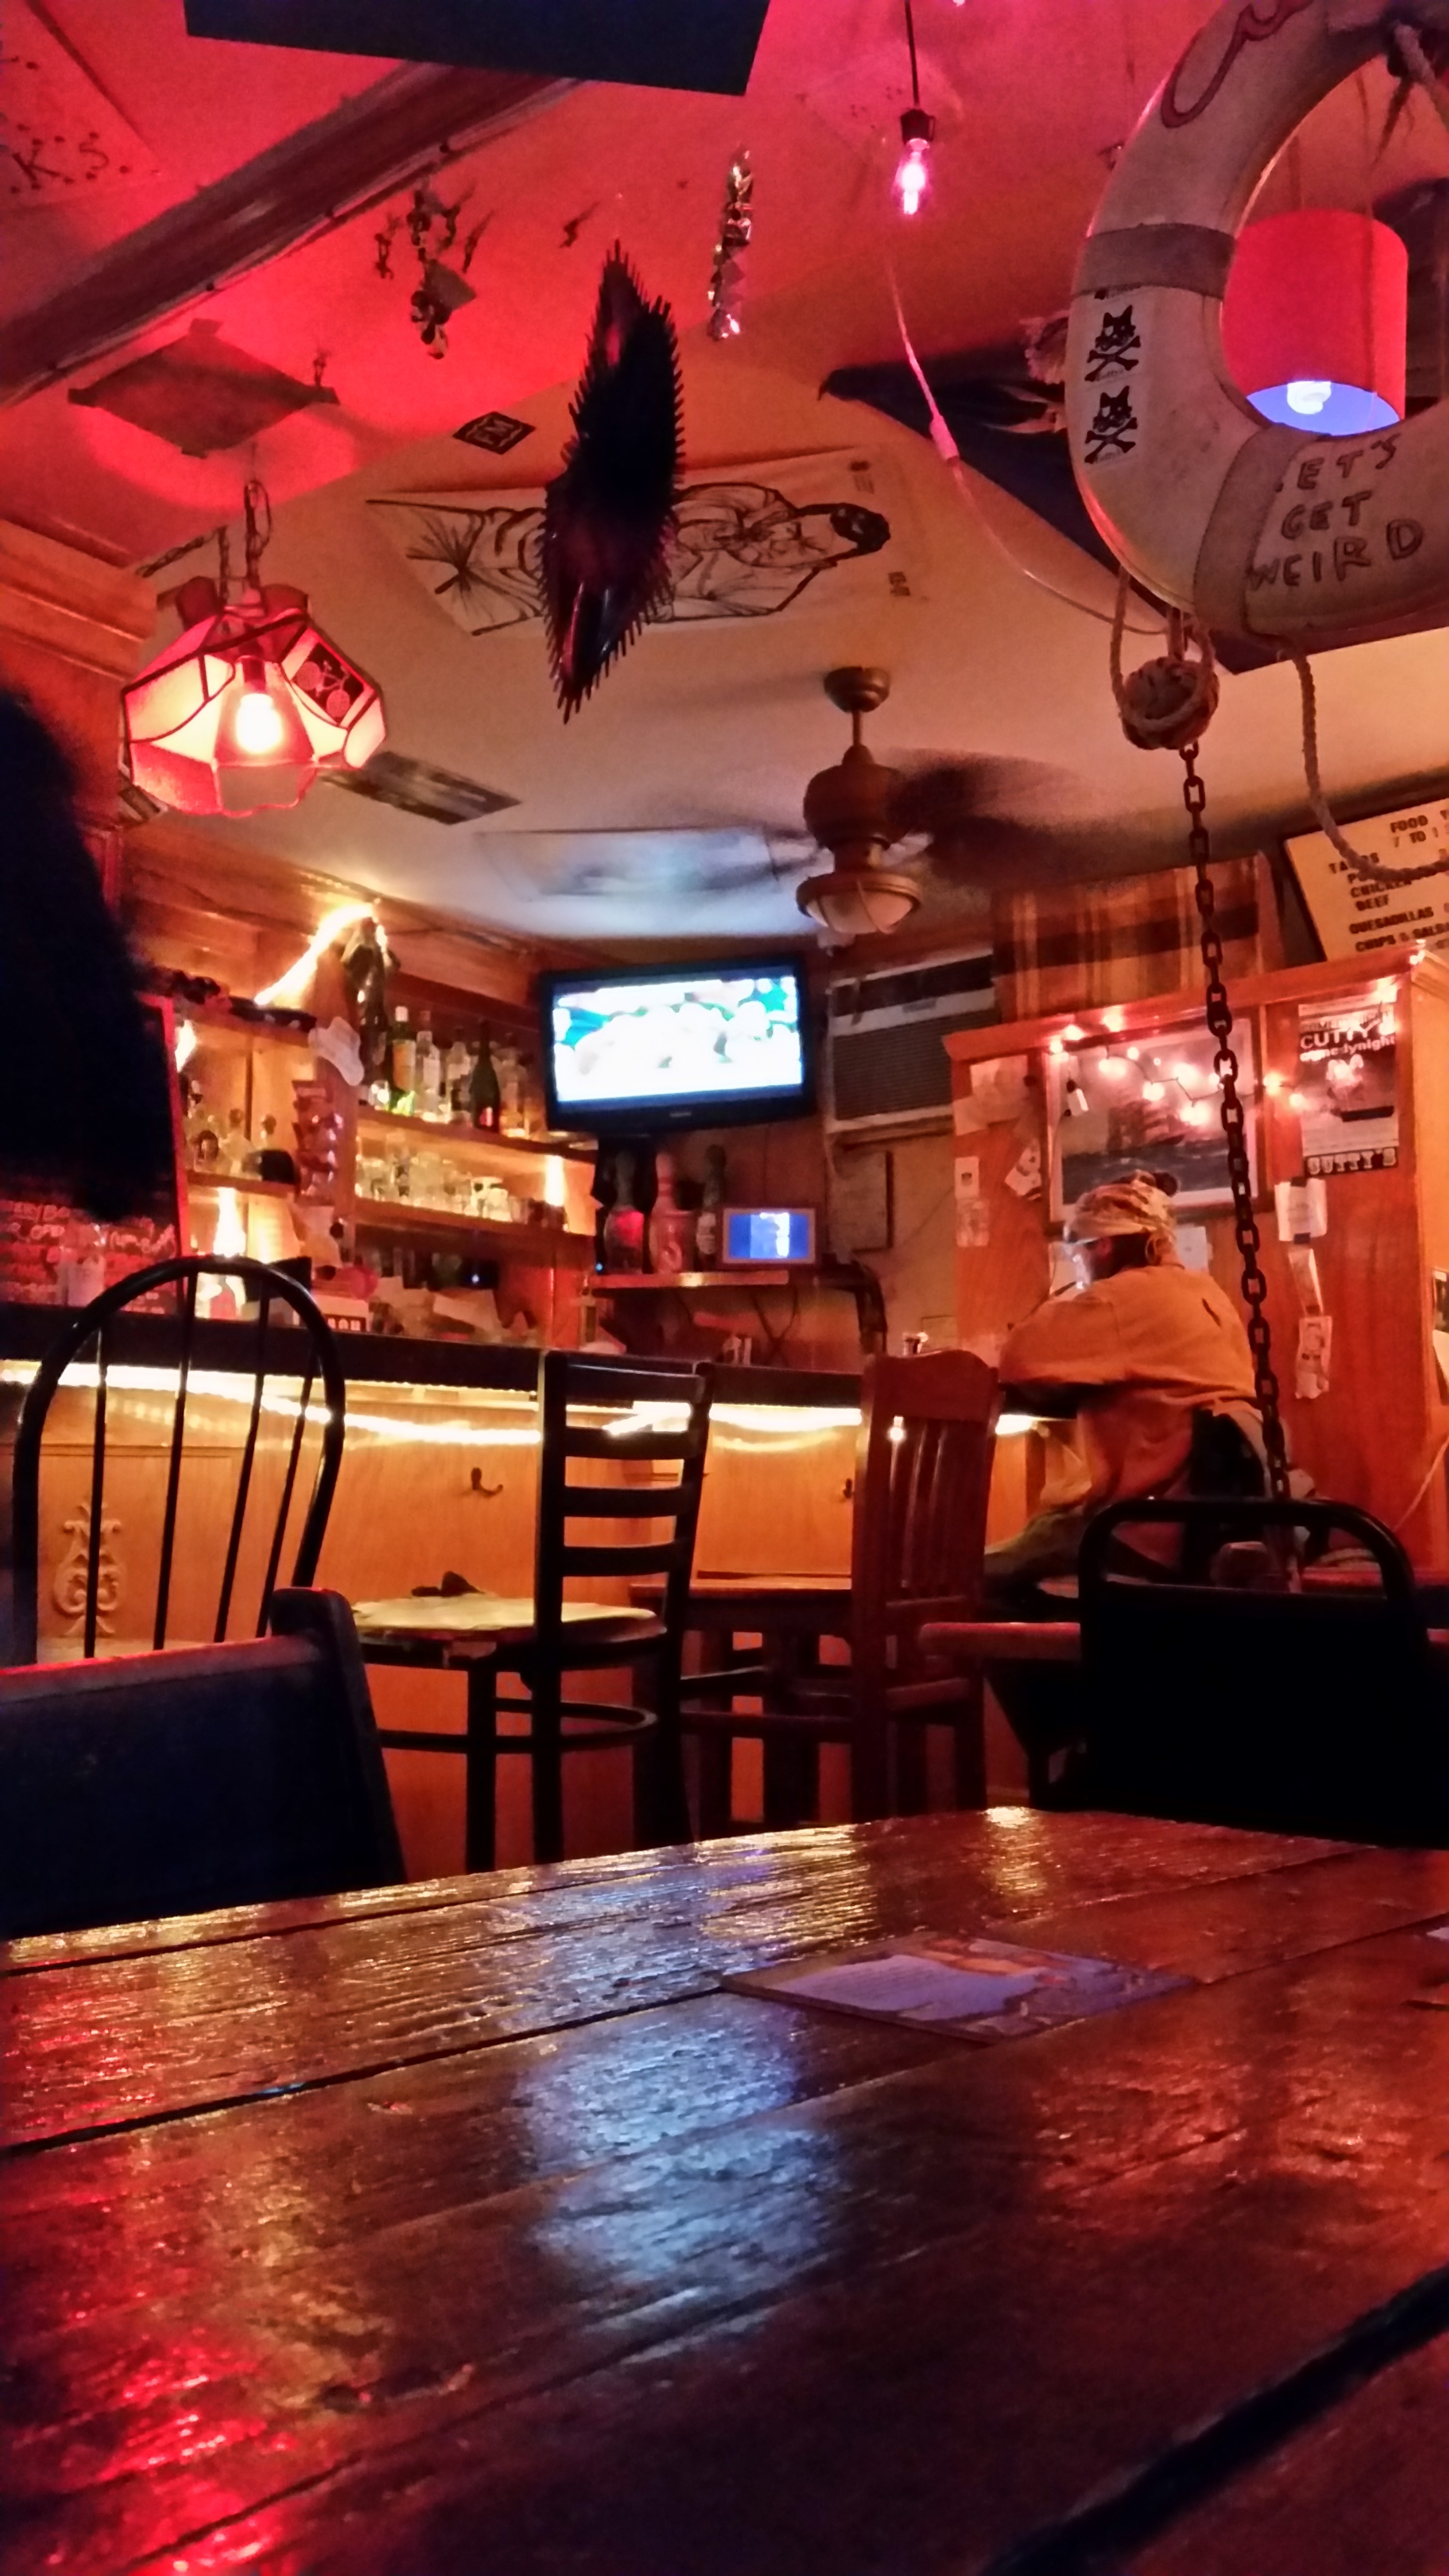 Cutty's bar in gentrifying area